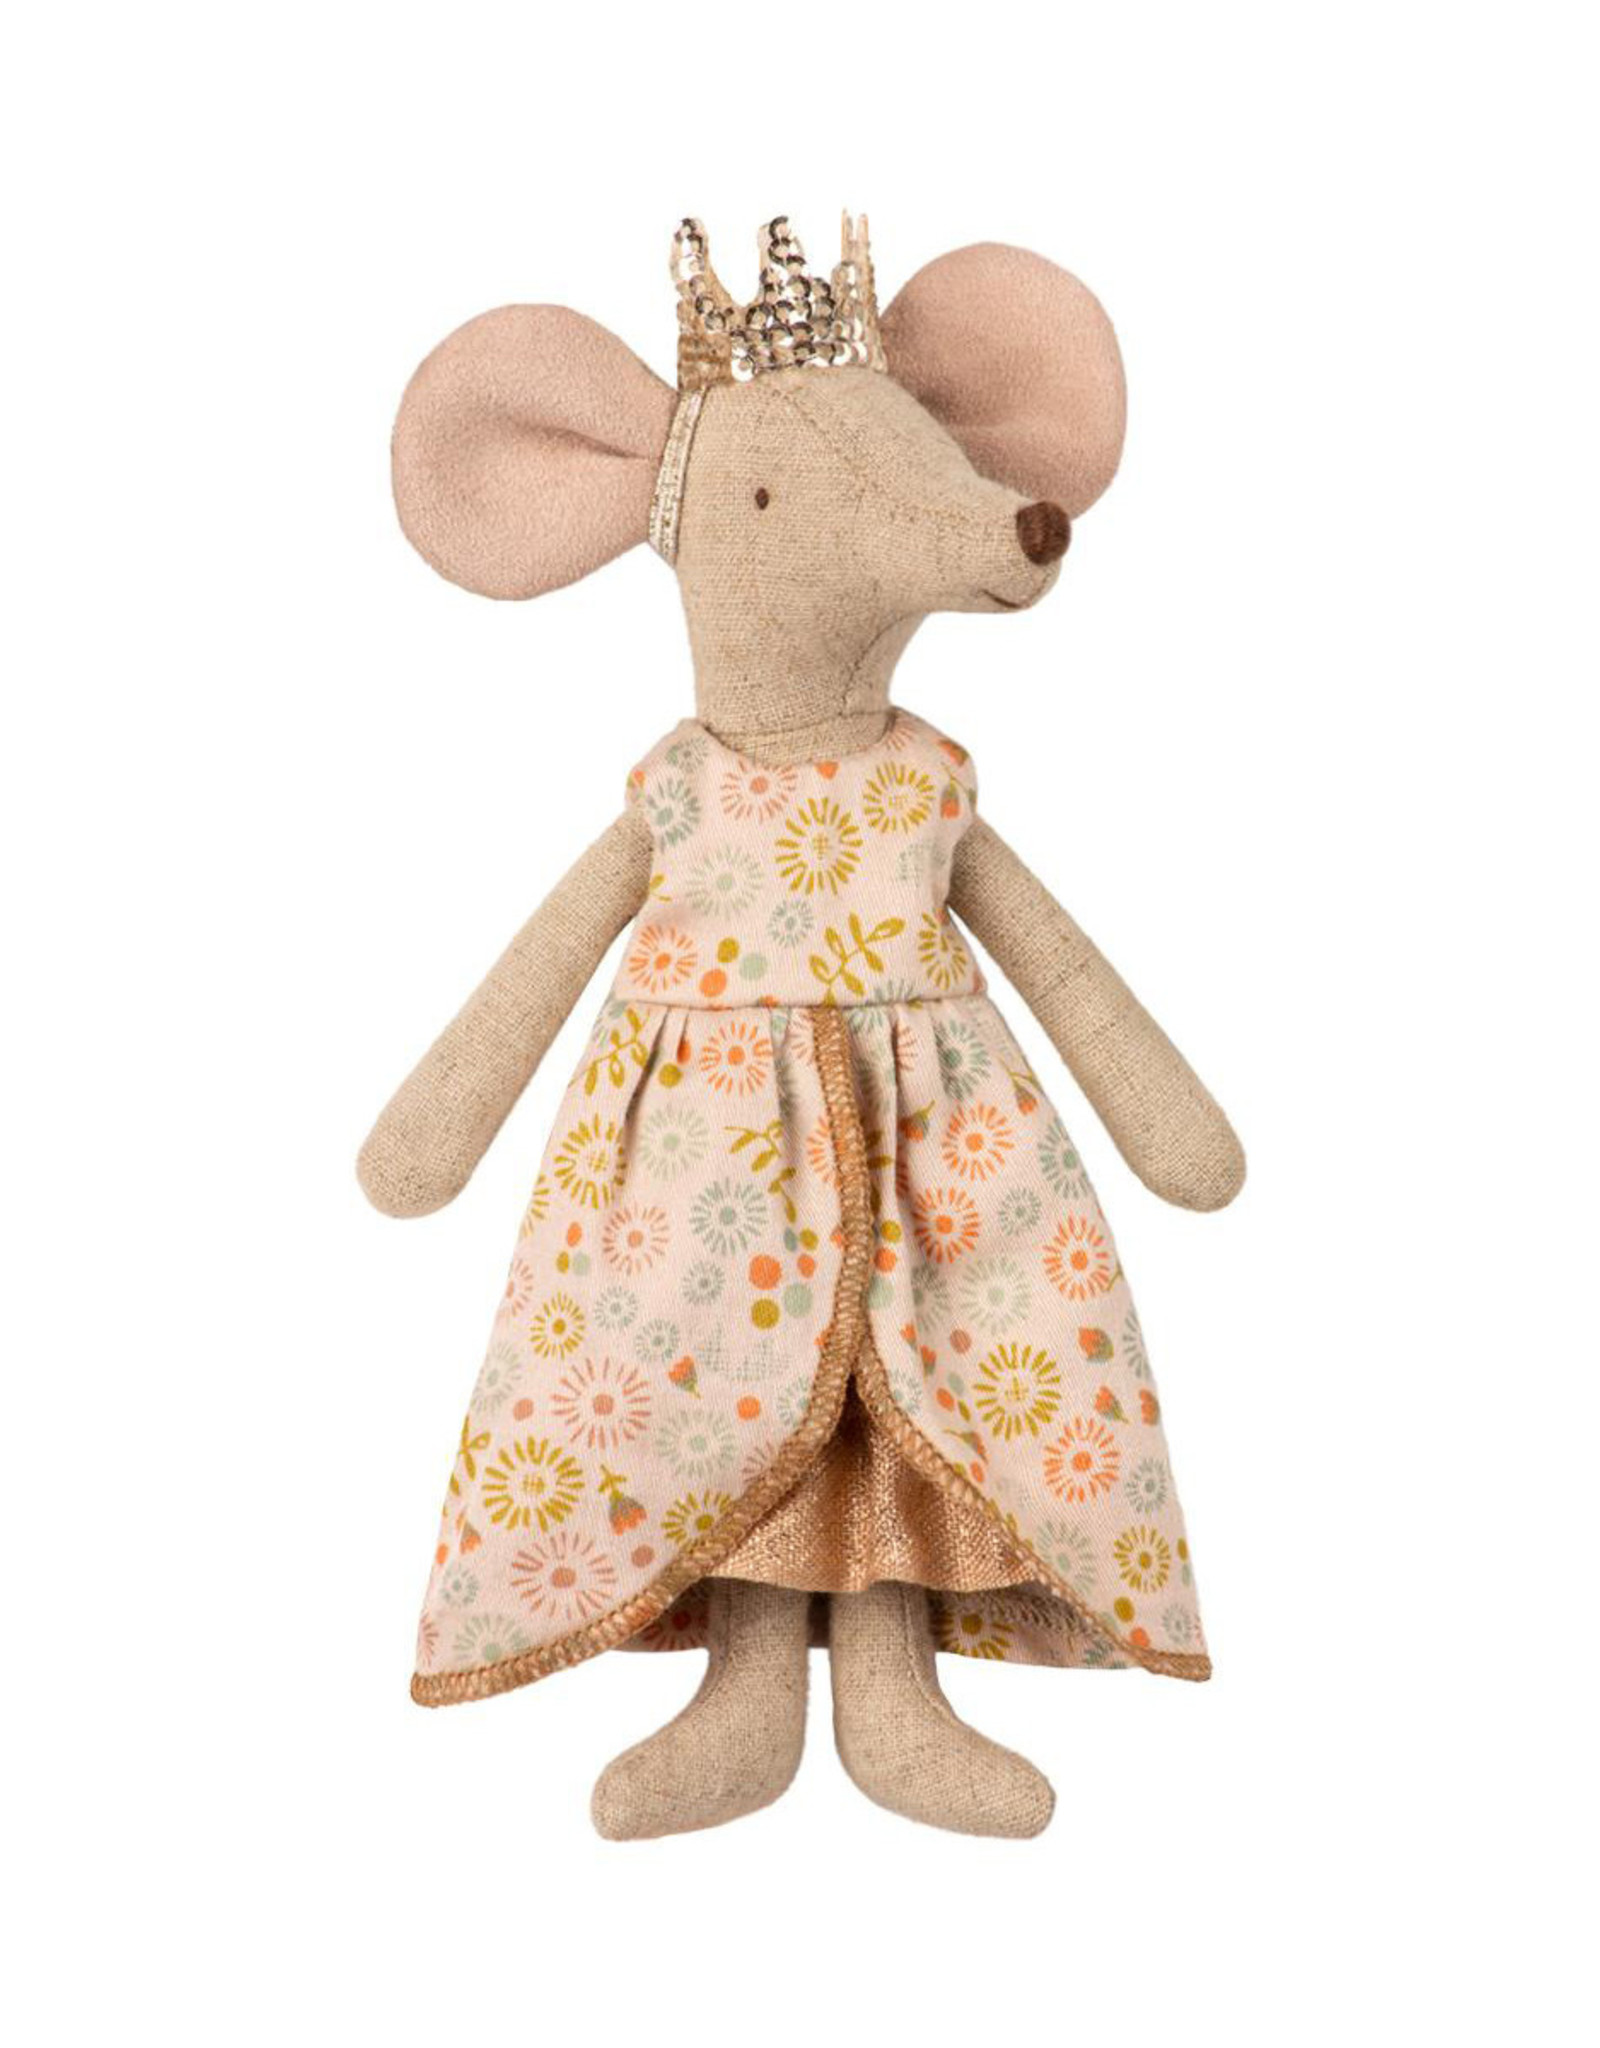 Maileg Queen Mouse - Peach Floral Dress